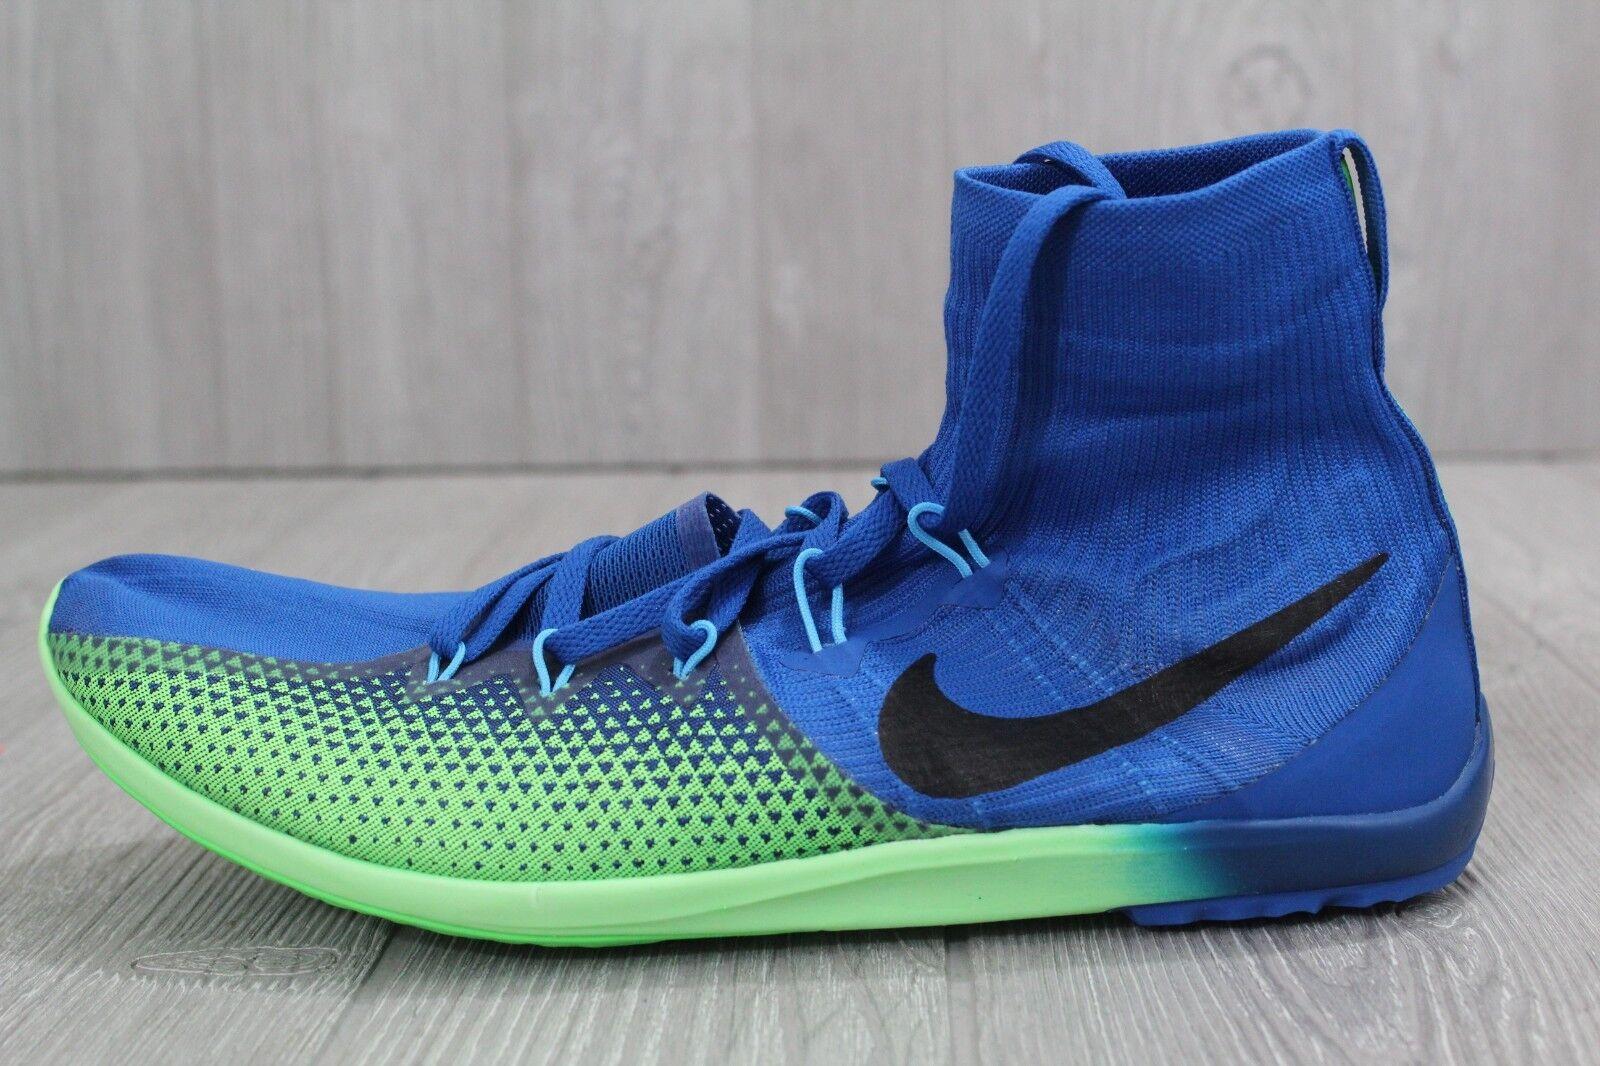 28 Nike Zoom Victory XC 4 Track Field Spikes bluee Green 878804-403 8 10.5 12